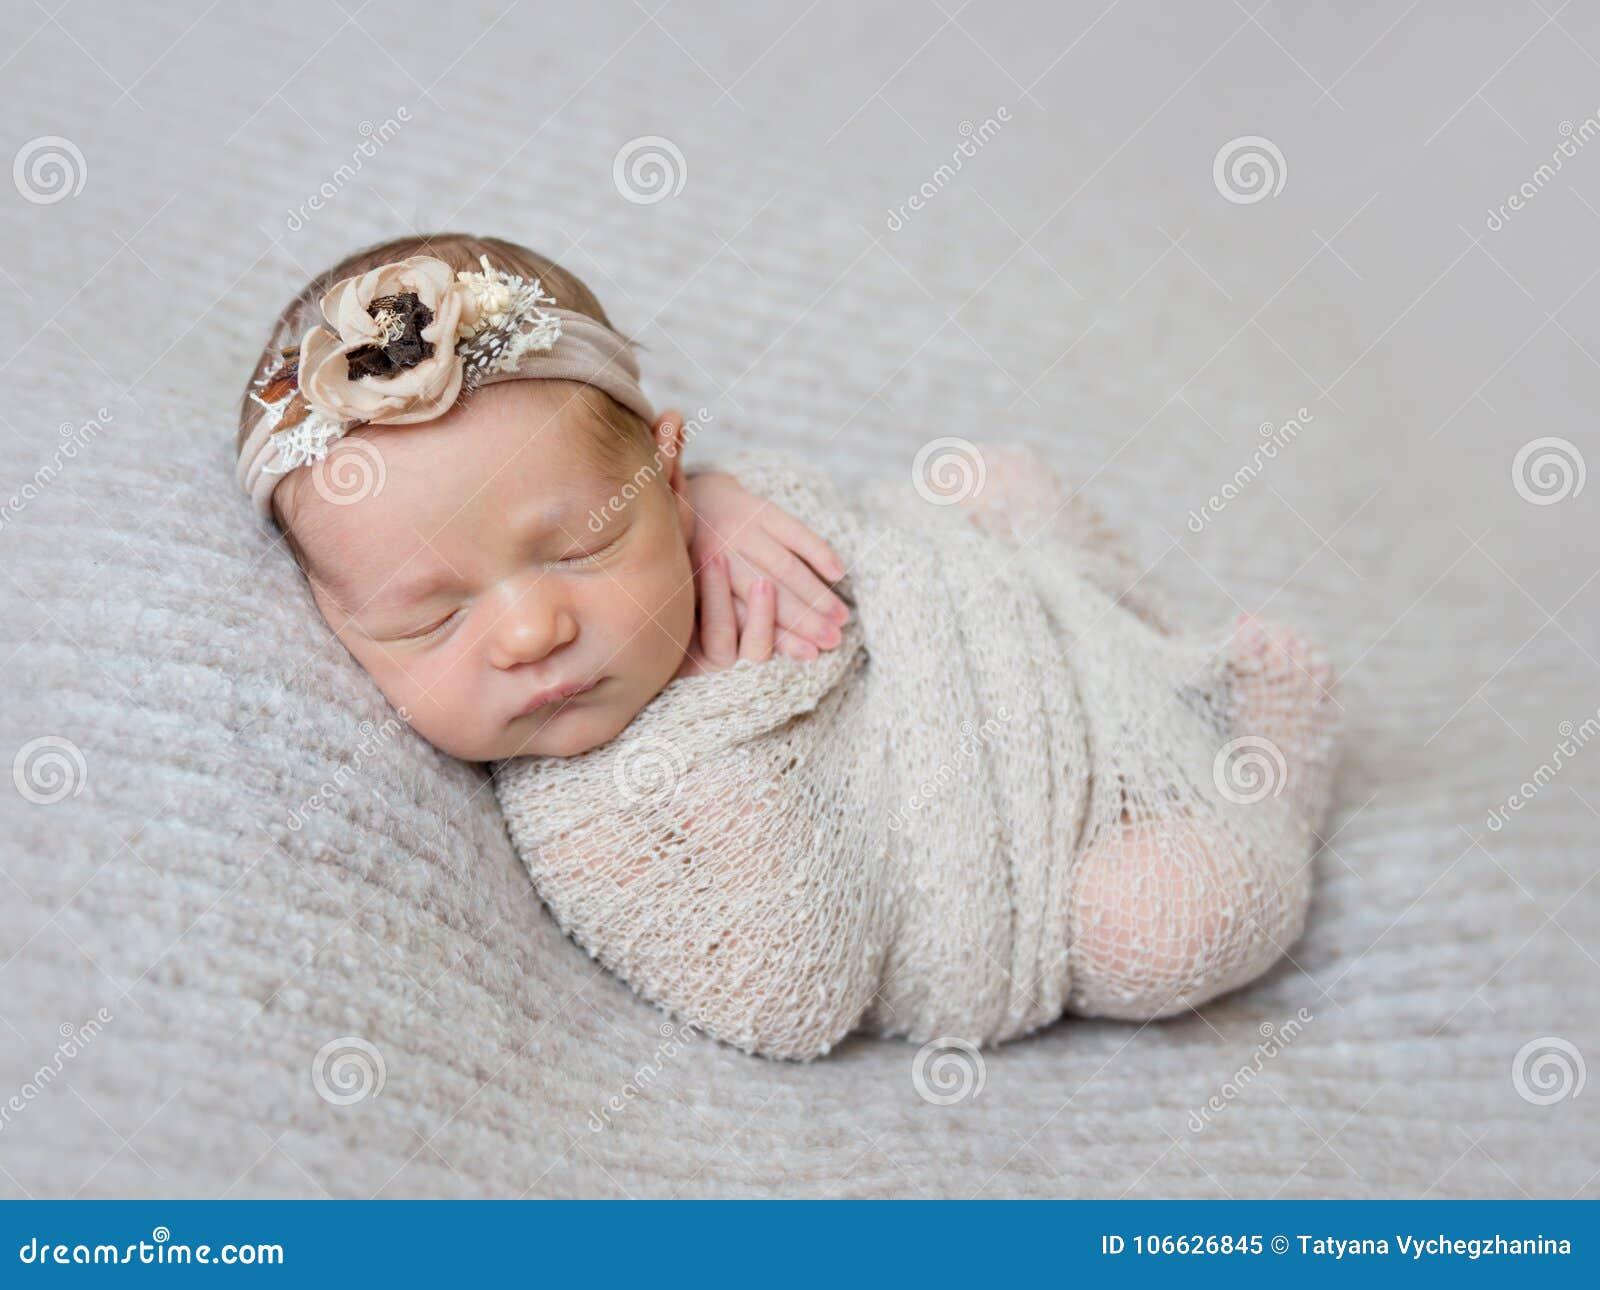 02c0efcb7 Newborn baby girl with flower headband on her little head swaddled in beige  wrap.